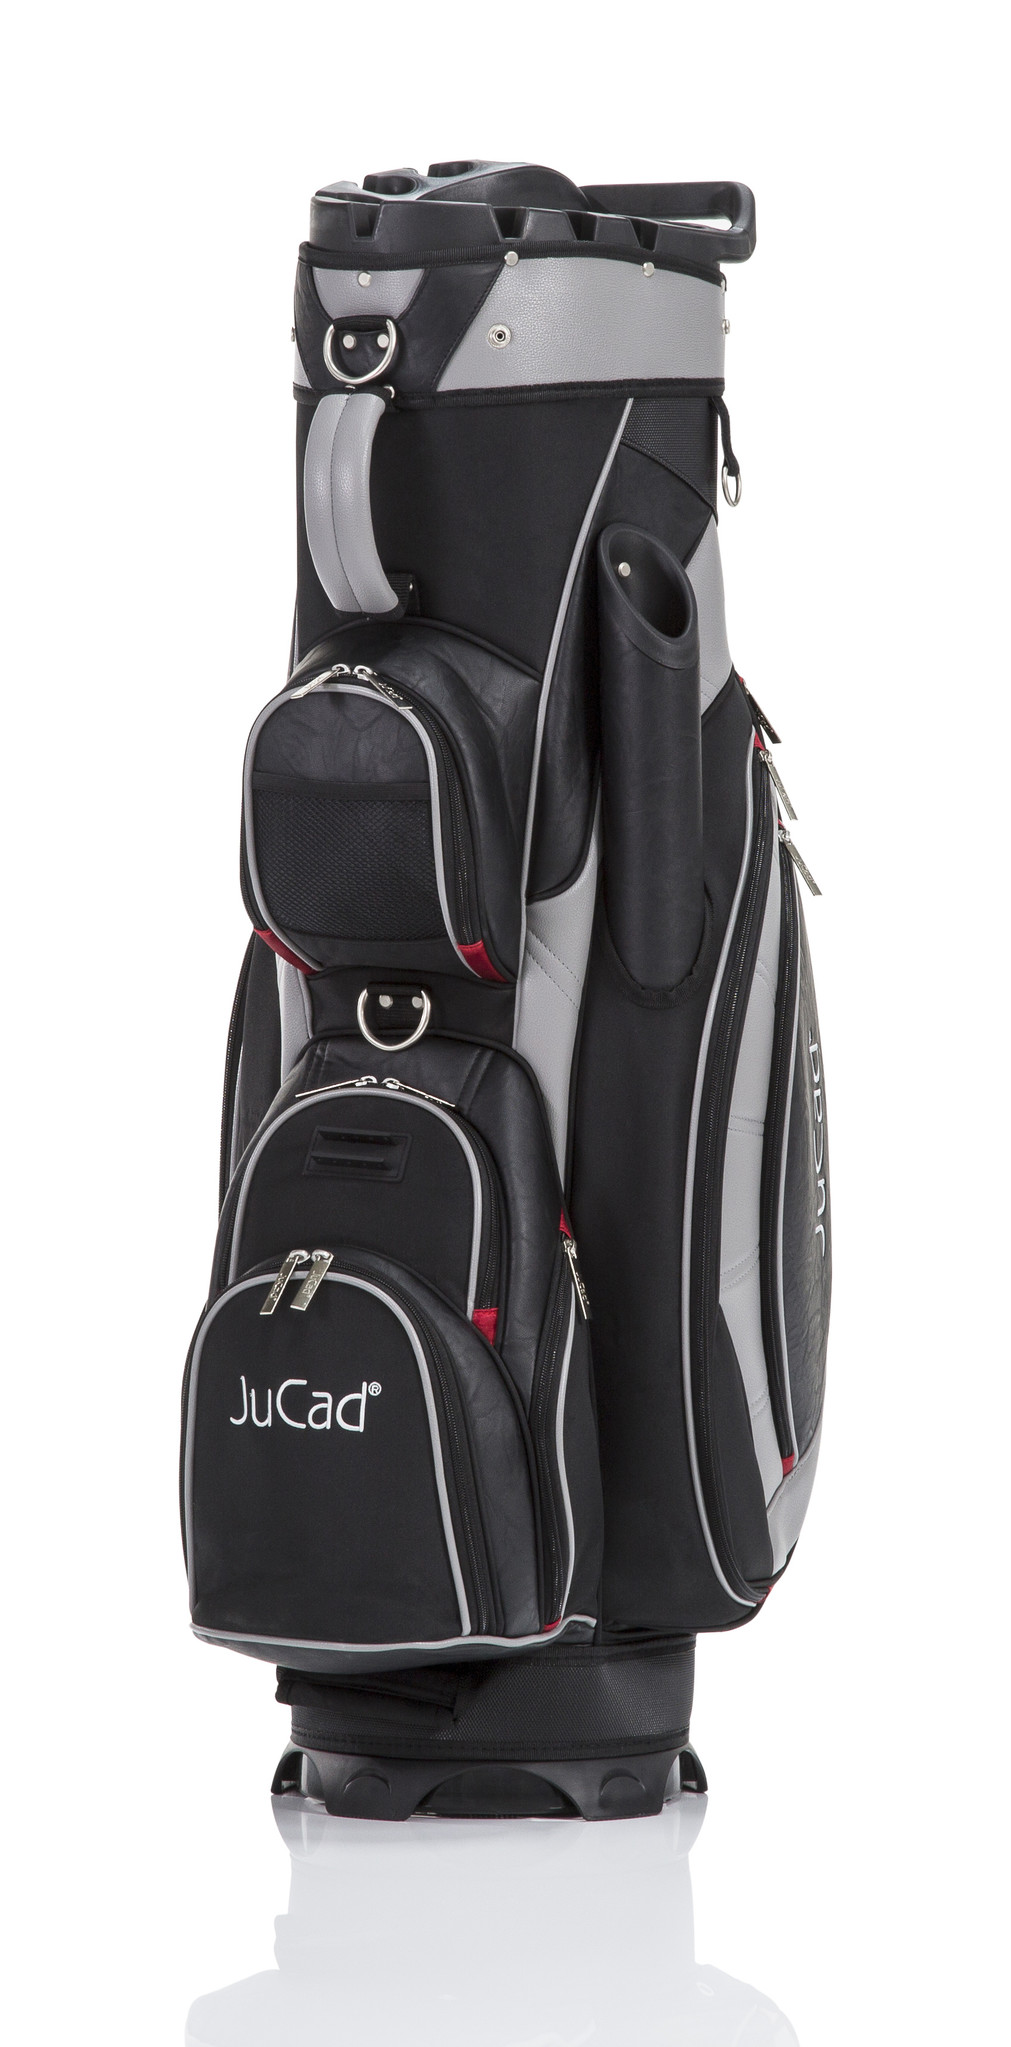 JuCad JuCad Manager (Schwarz-Titan)